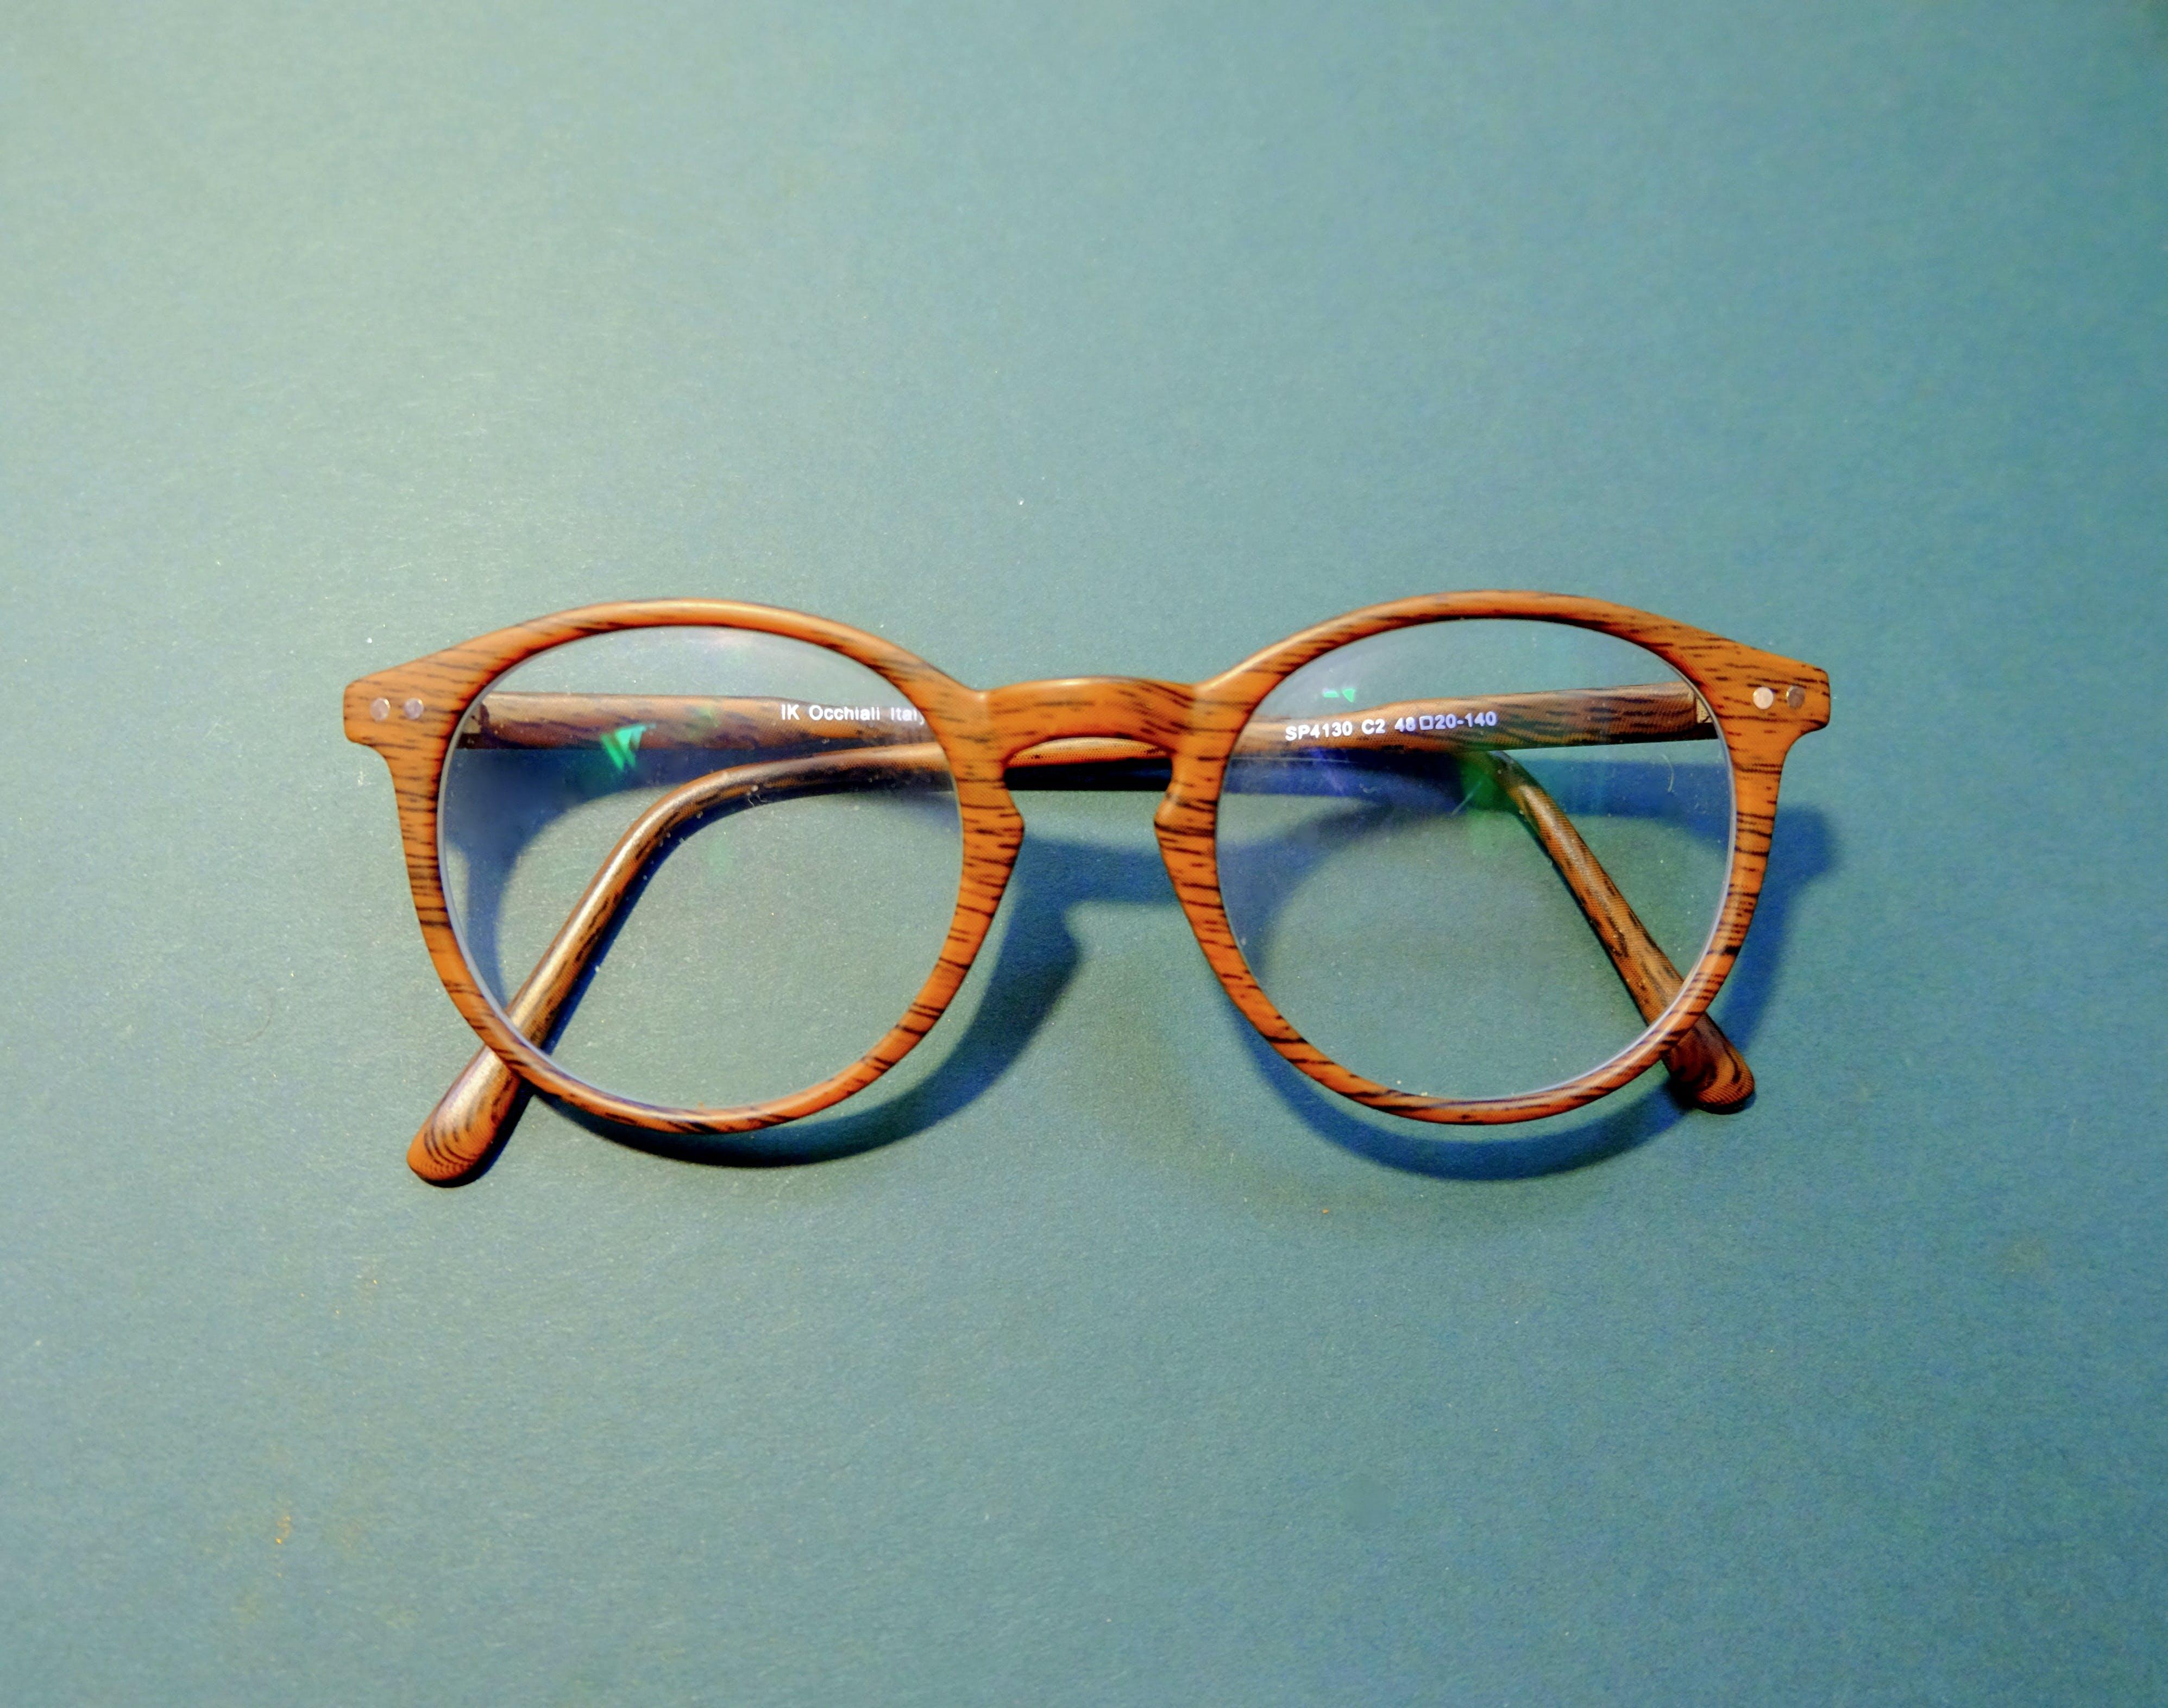 Brown-framed Eyeglasses